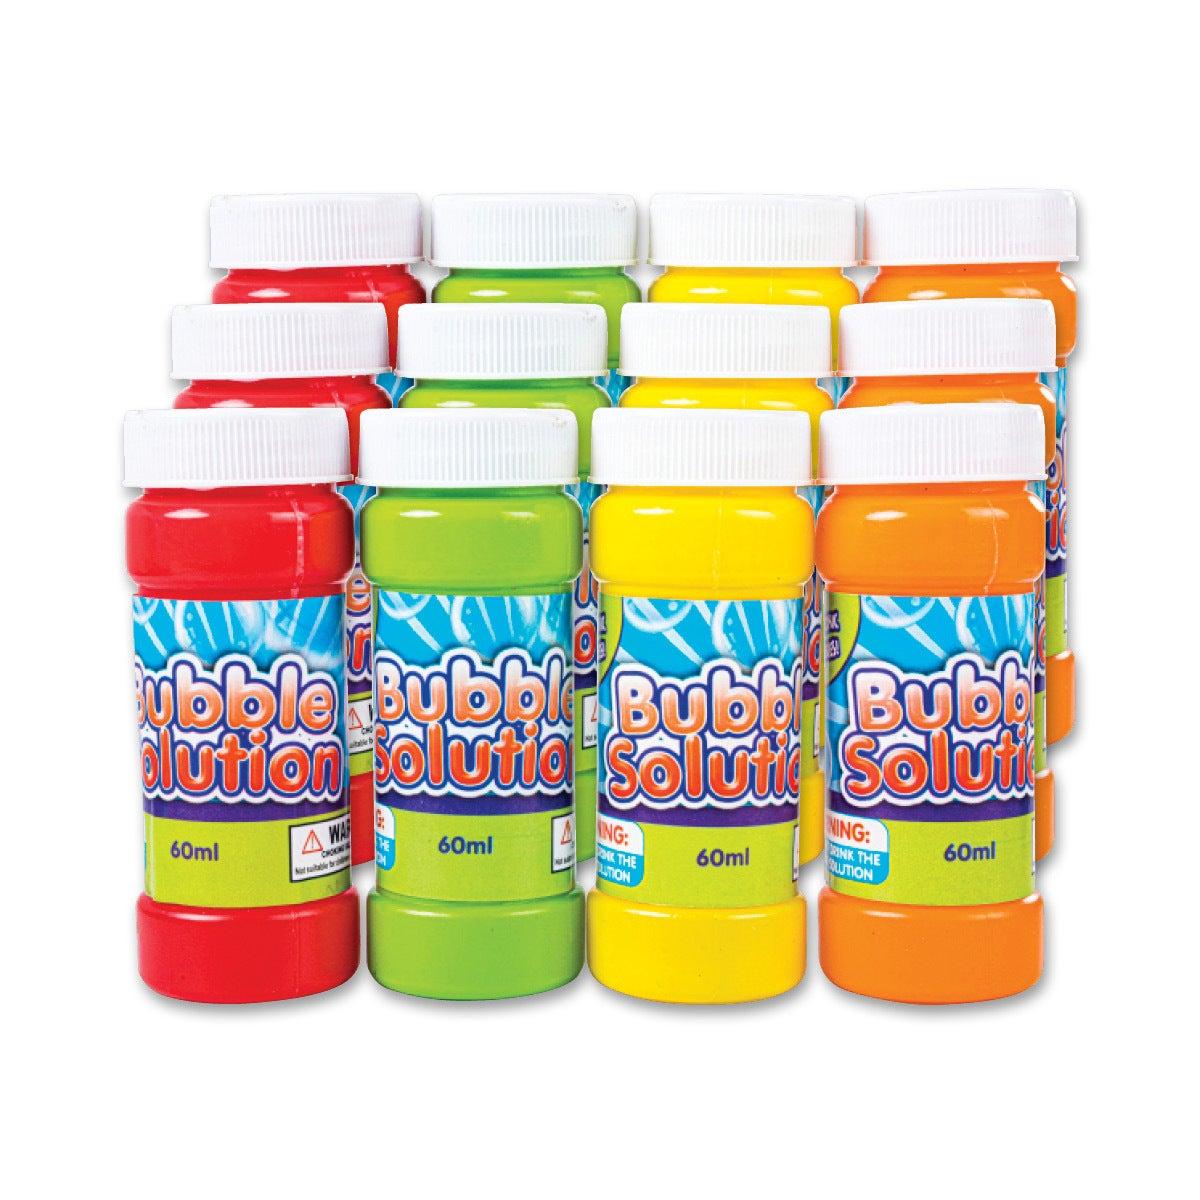 12PK Bubble & Wand Mega Value 60ML Non-Toxic Indoor/Outdoor Play Wedding Party